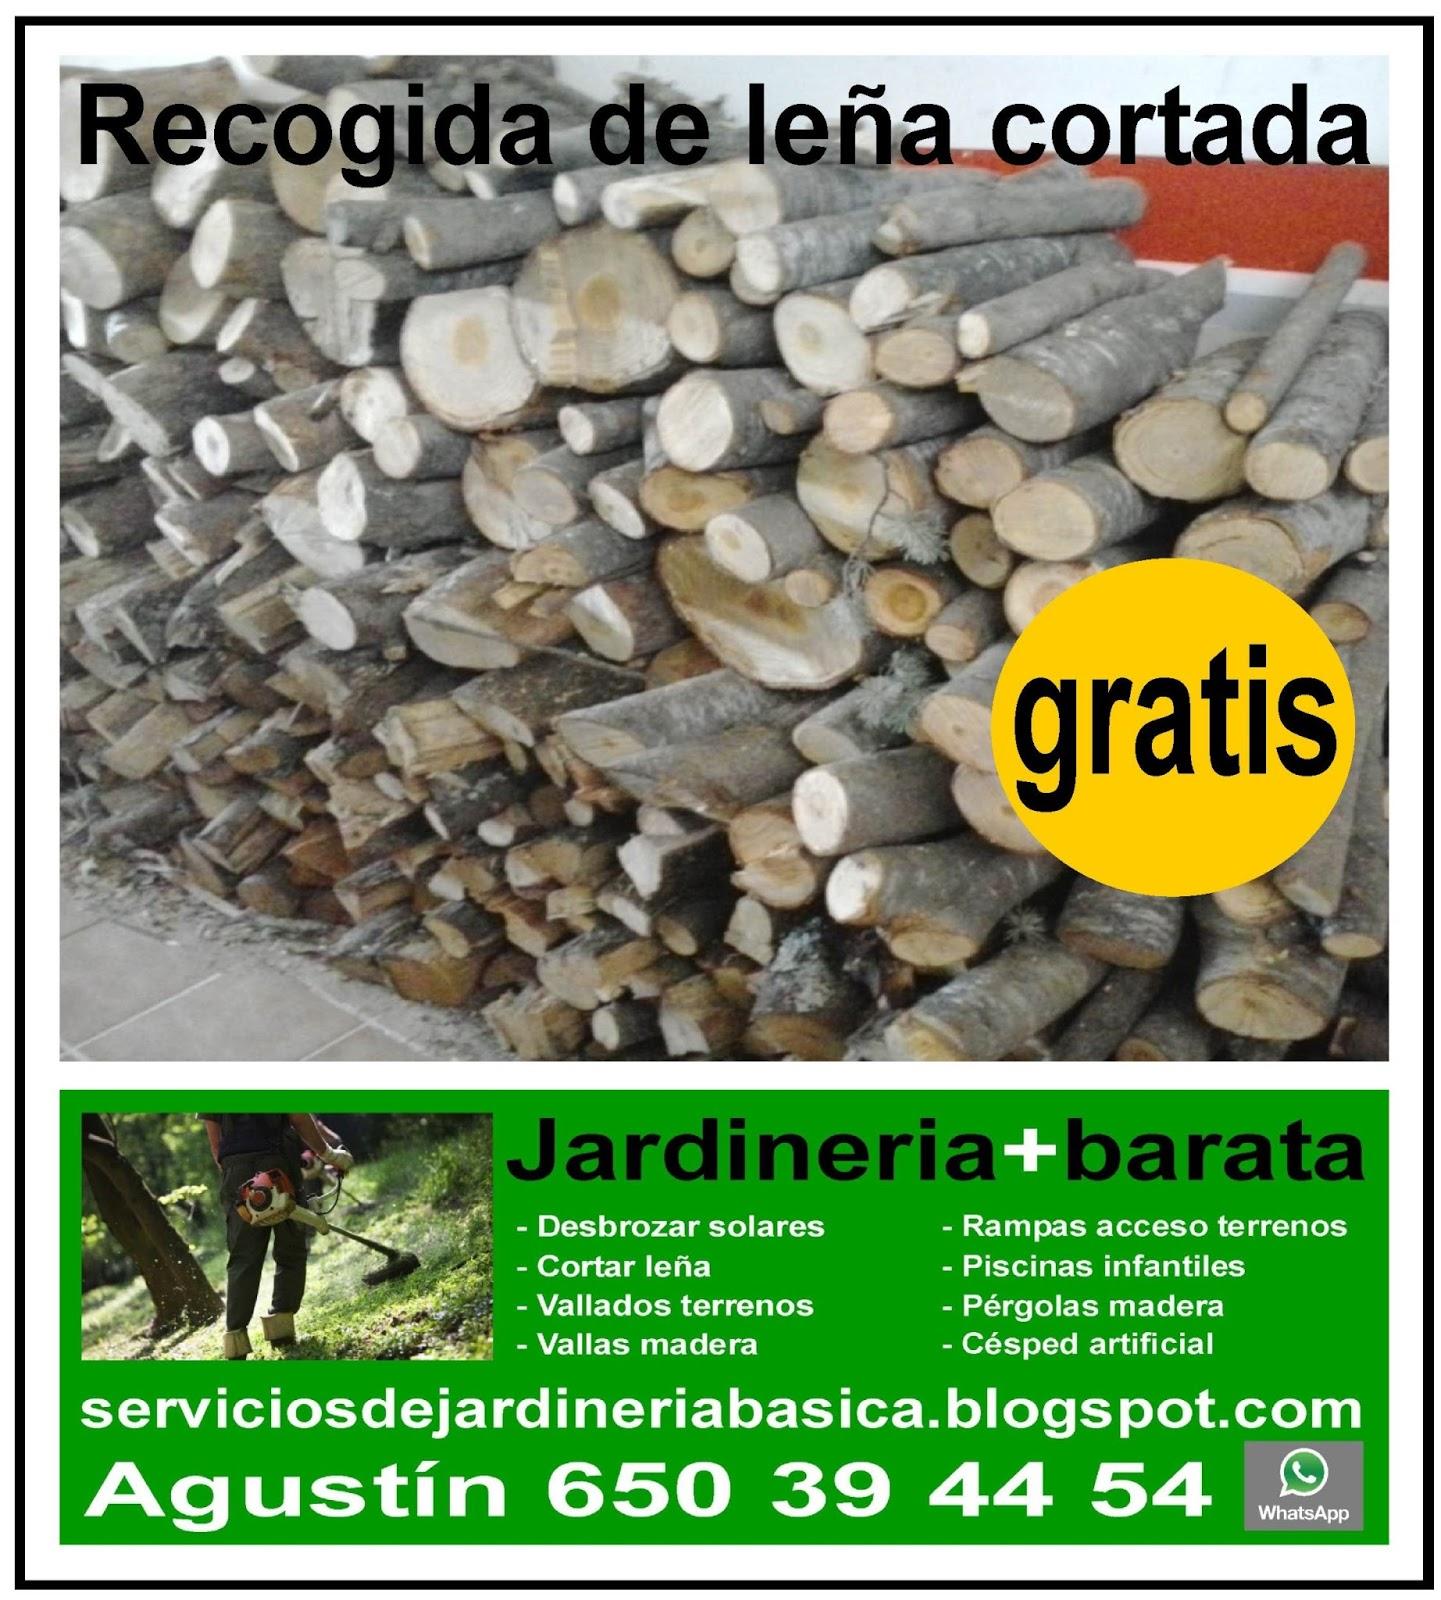 Serviciosdejardineriabasica jardineria barata gratis for Jardineria a domicilio barcelona